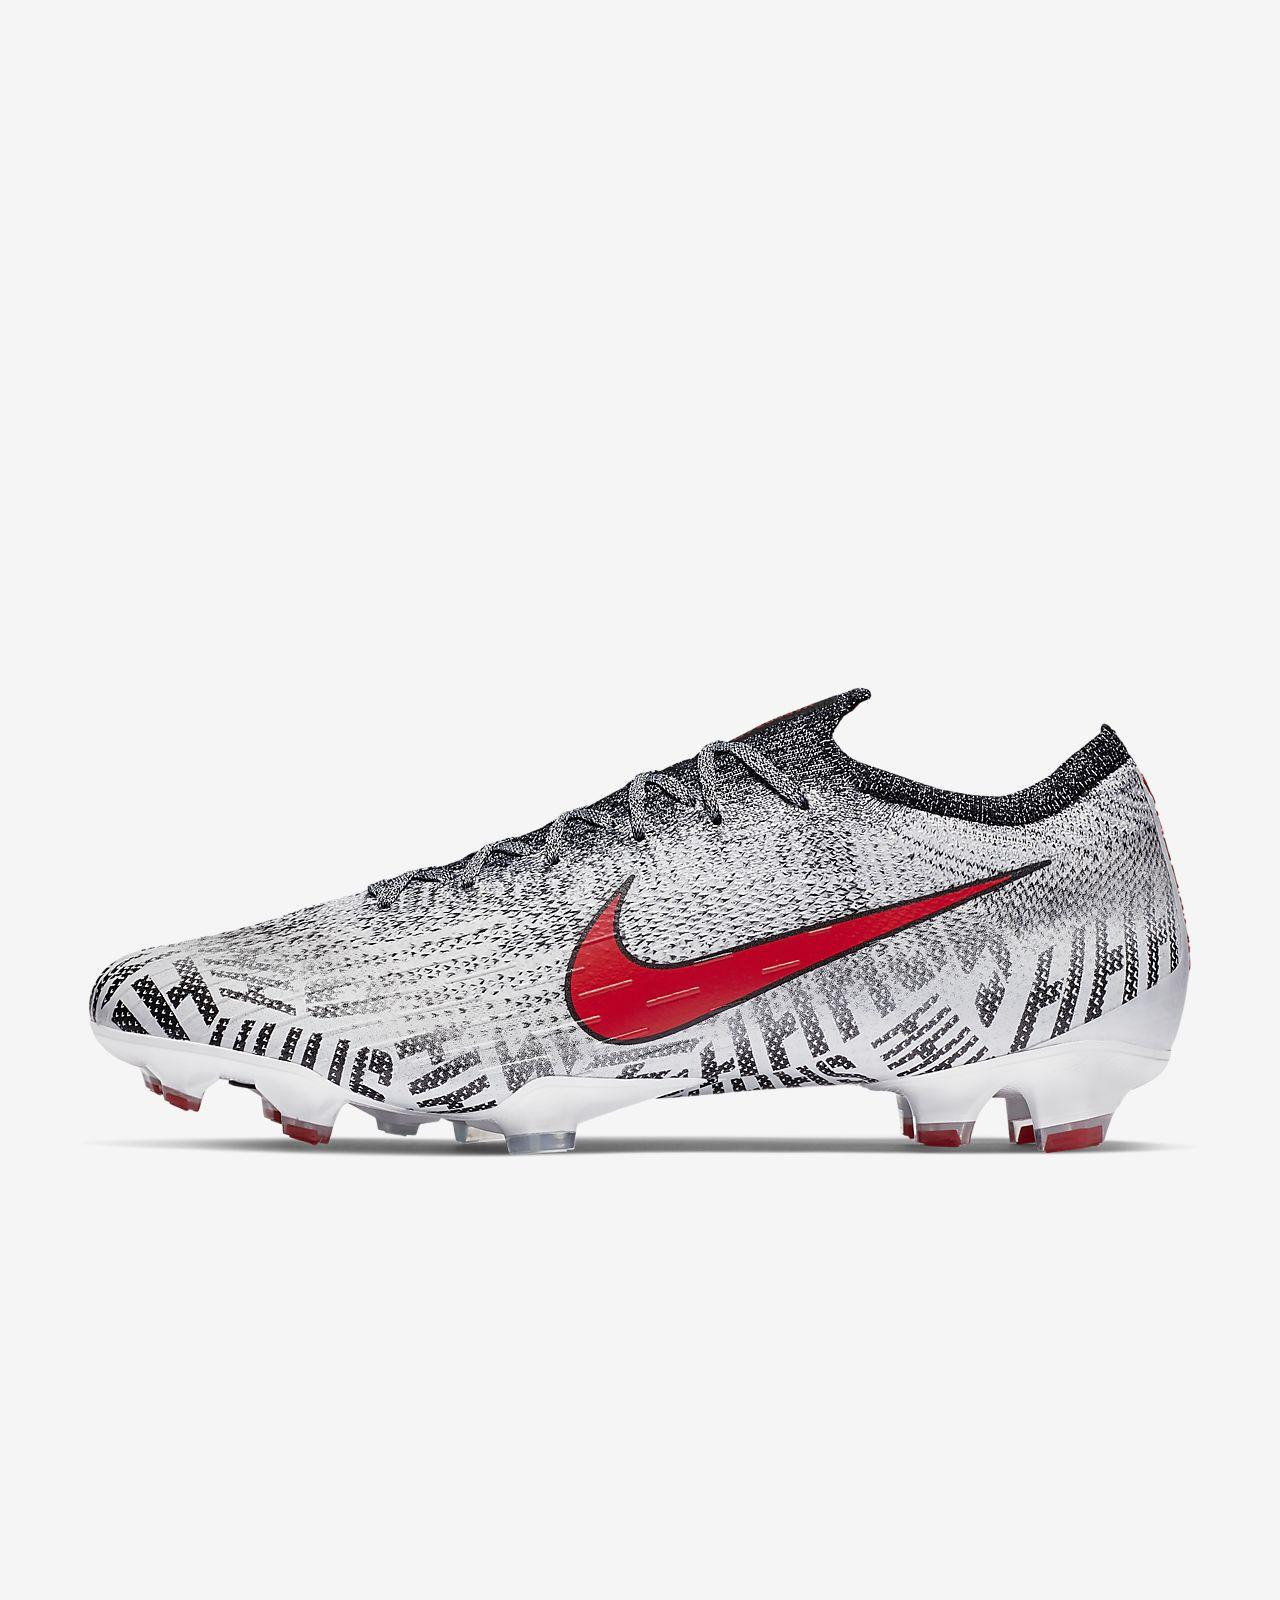 137890d55 ... Nike Mercurial Vapor 360 Elite Neymar Jr Botas de fútbol para terreno  firme